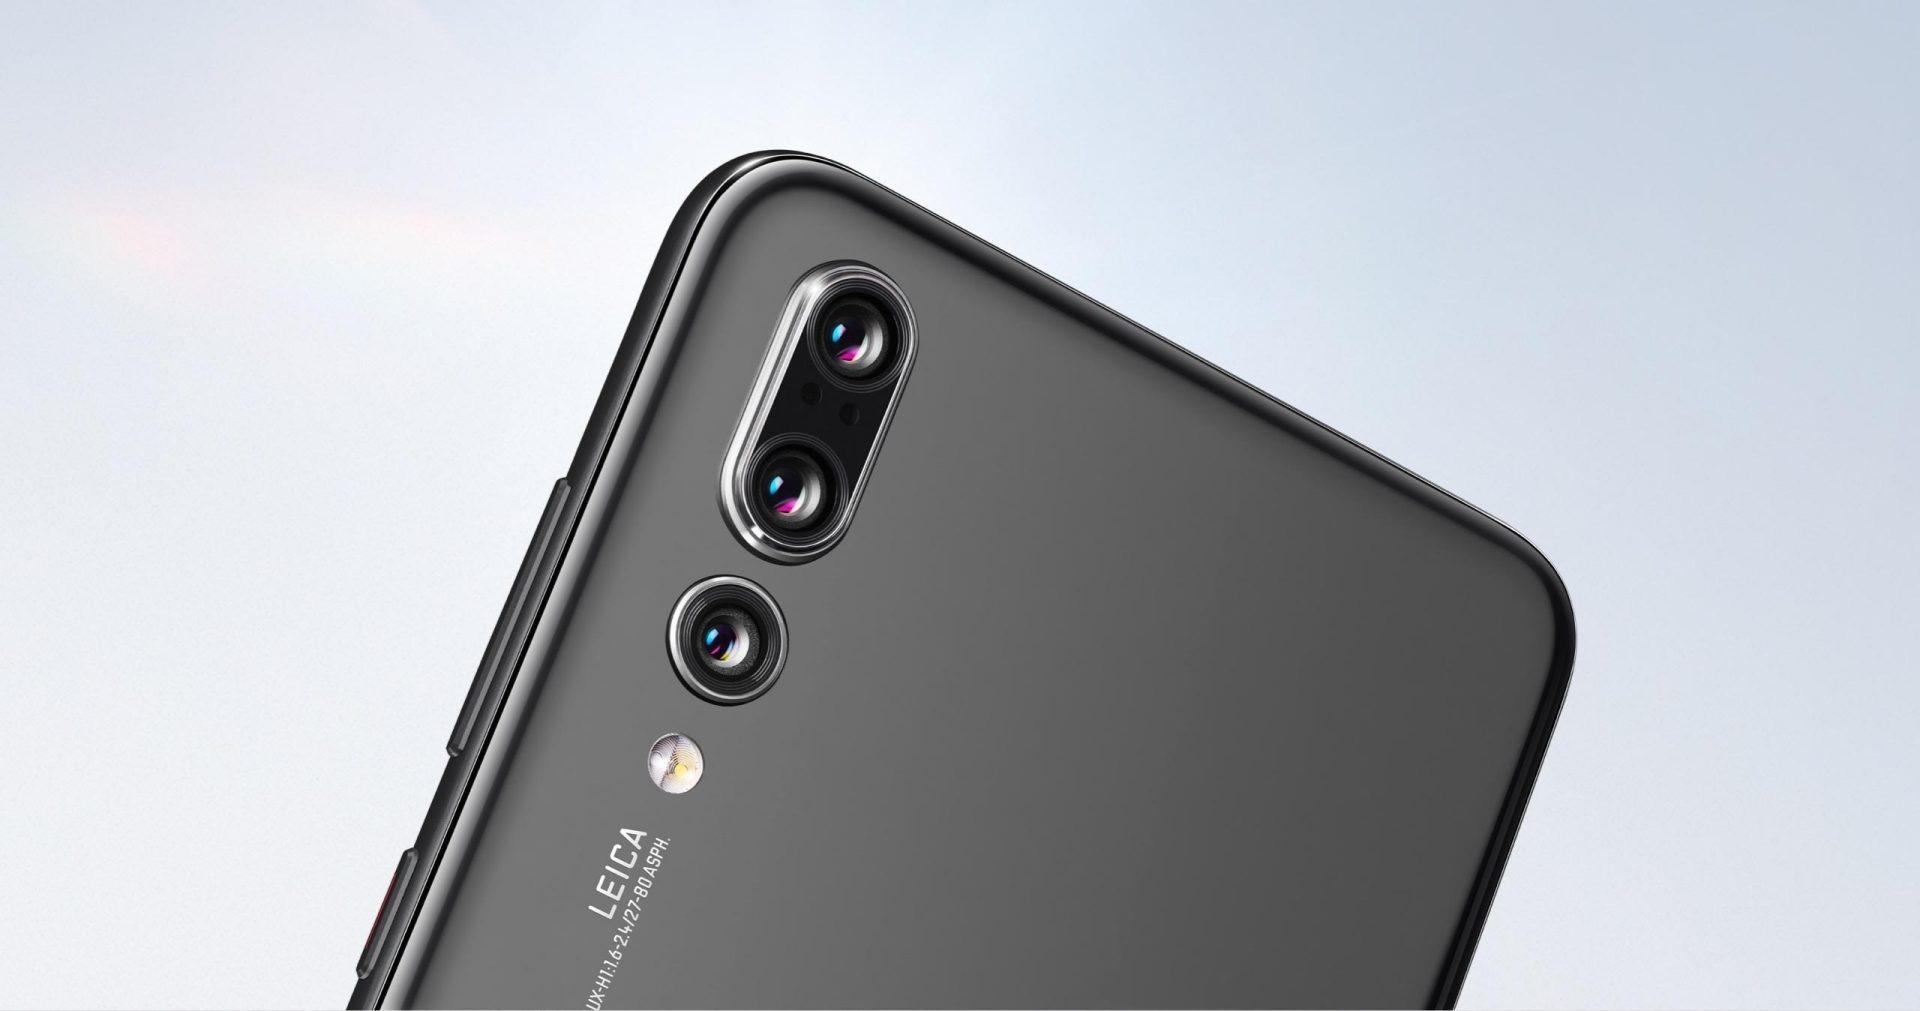 Foto de la cámara del Huawei P20 Pro